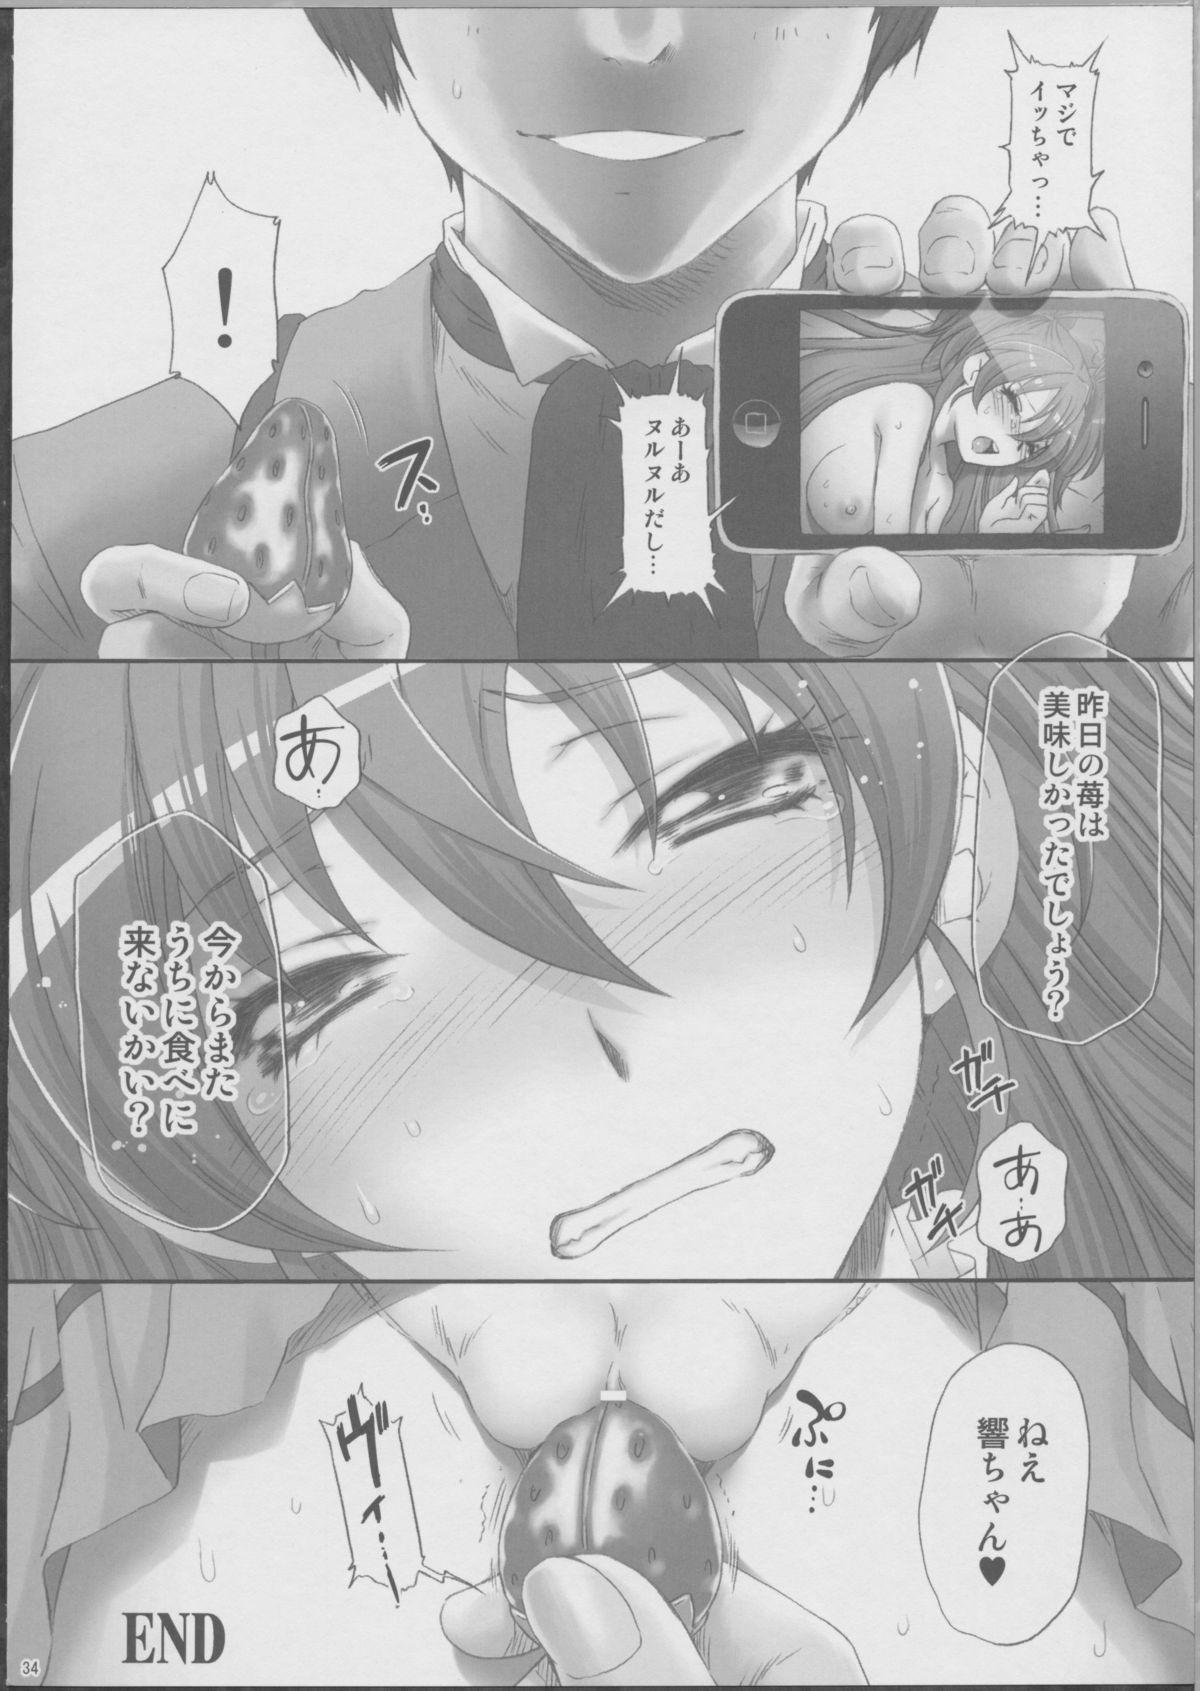 Hibiki de asobou ♪ 32